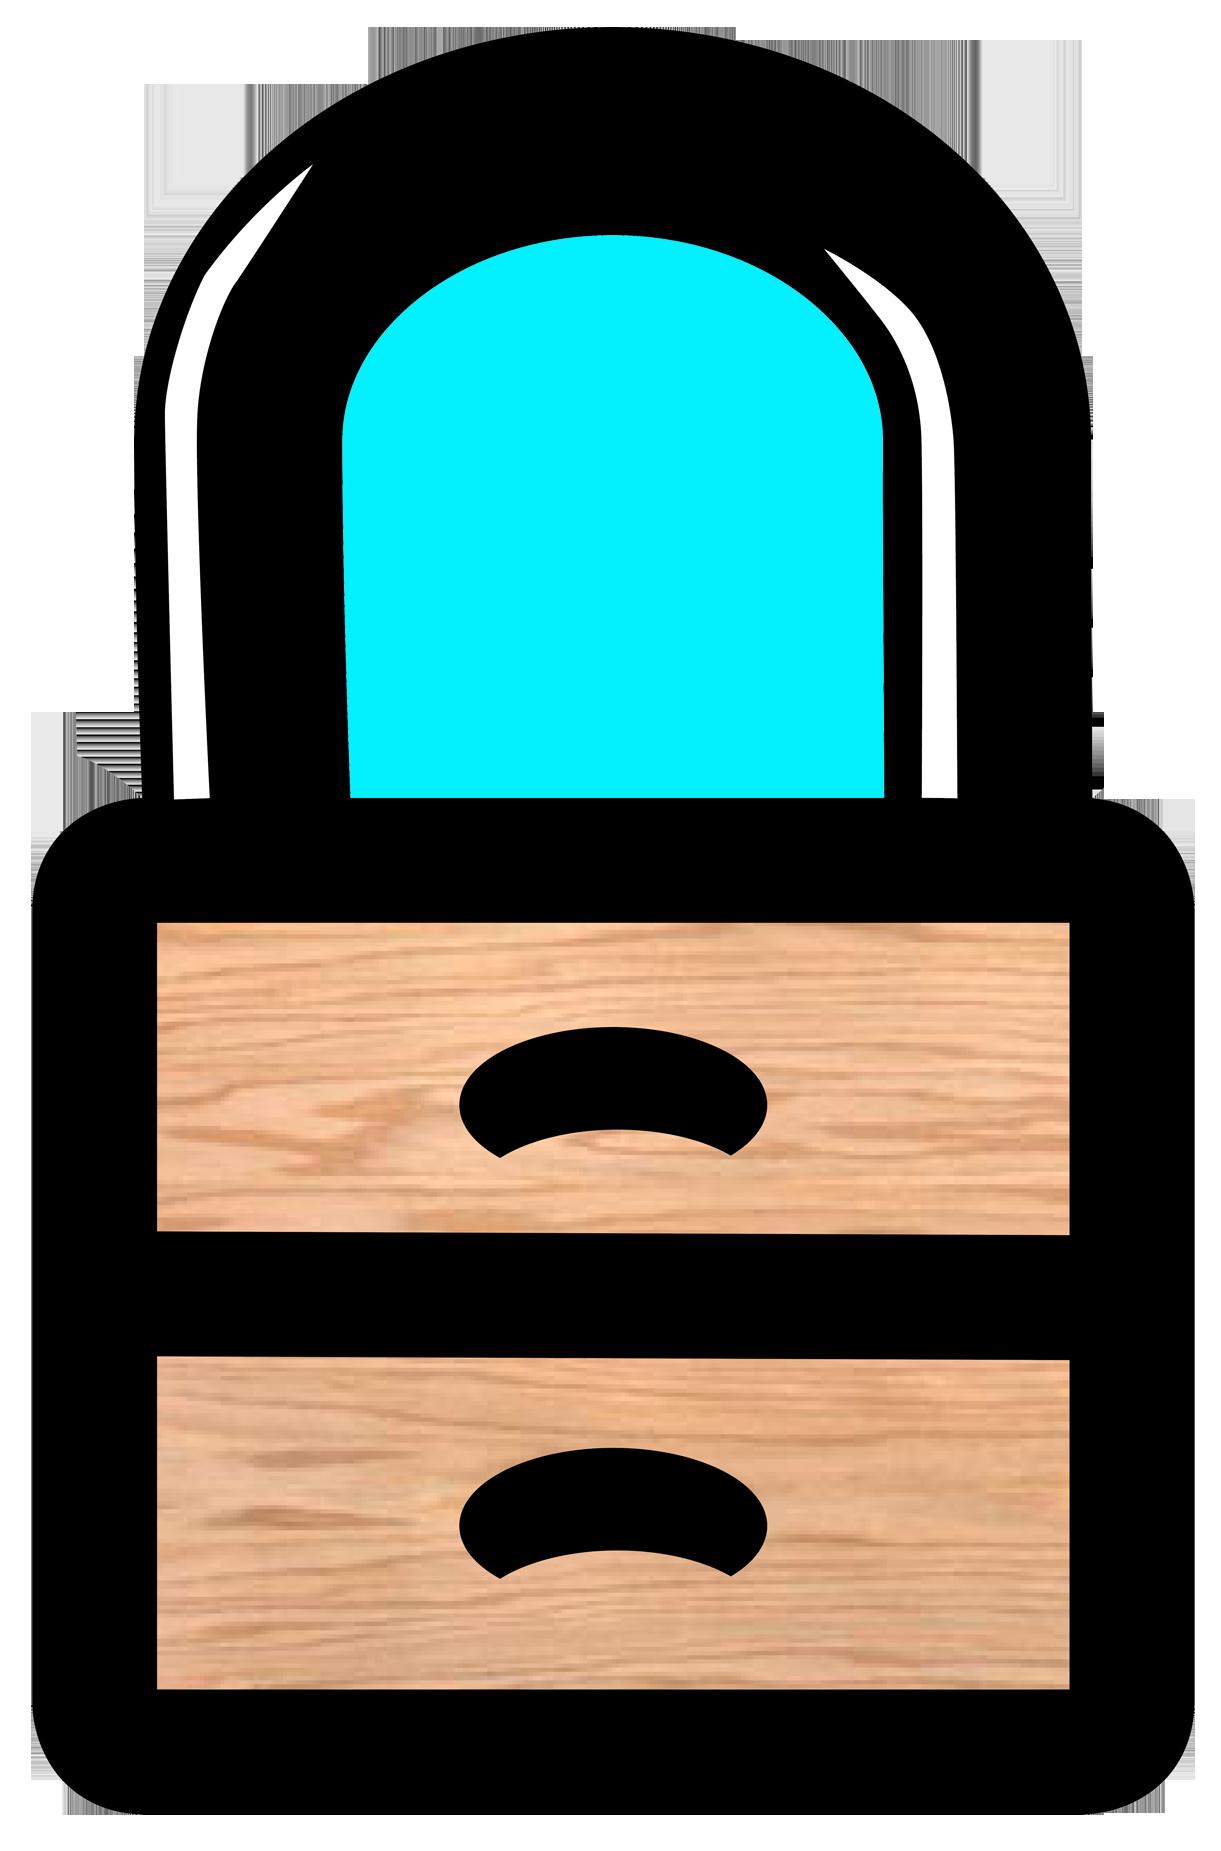 Secret clipart covert. Magazine rack with compartment